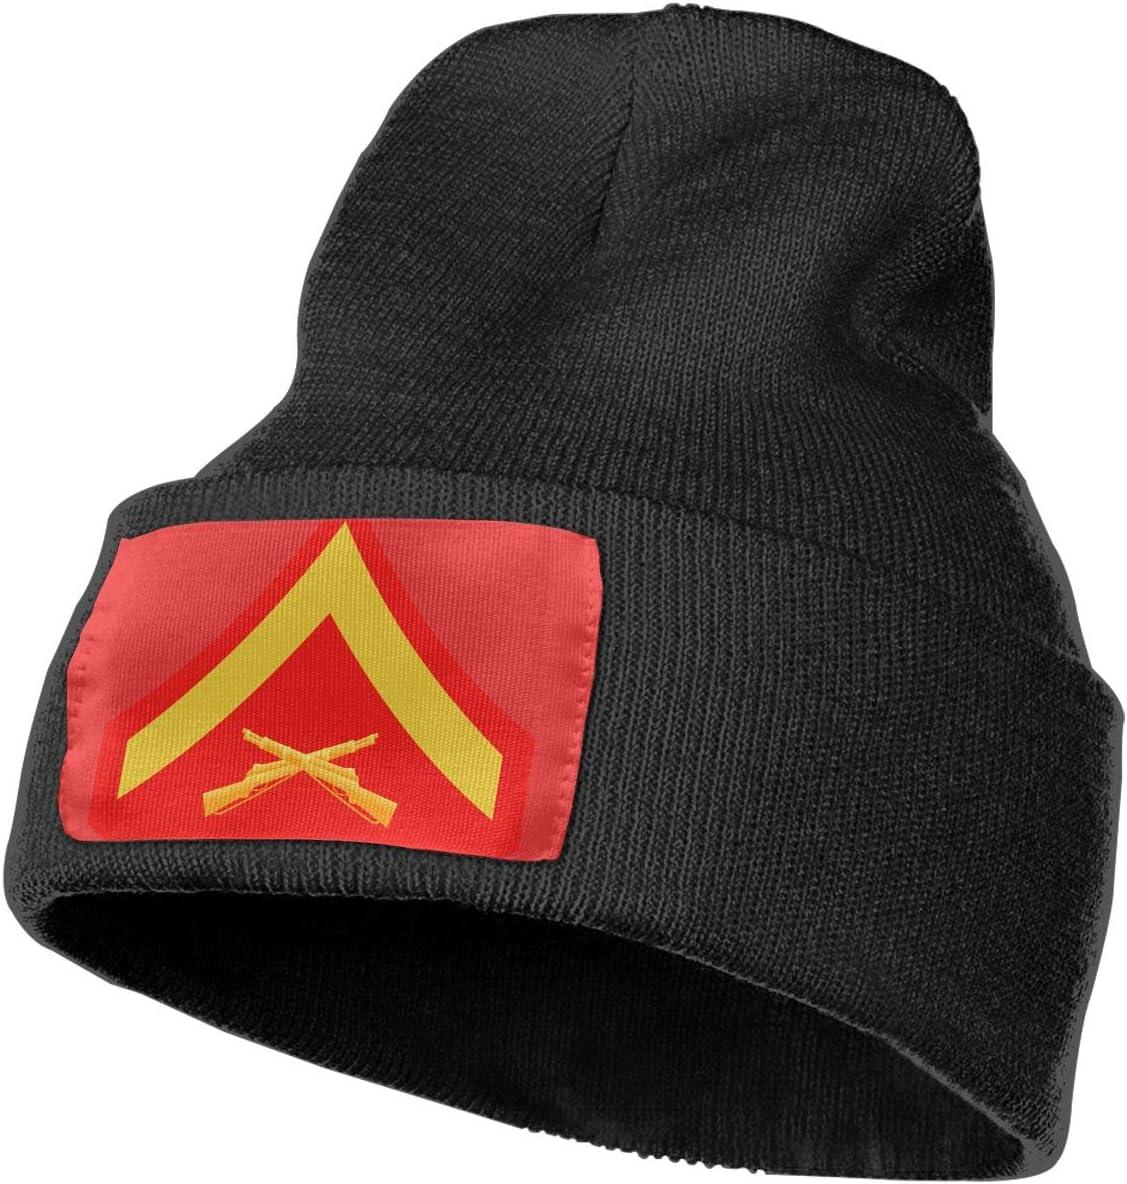 USMC Lance Corporal E3 Men/&Women Warm Winter Knit Plain Beanie Hat Skull Cap Acrylic Knit Cuff Hat